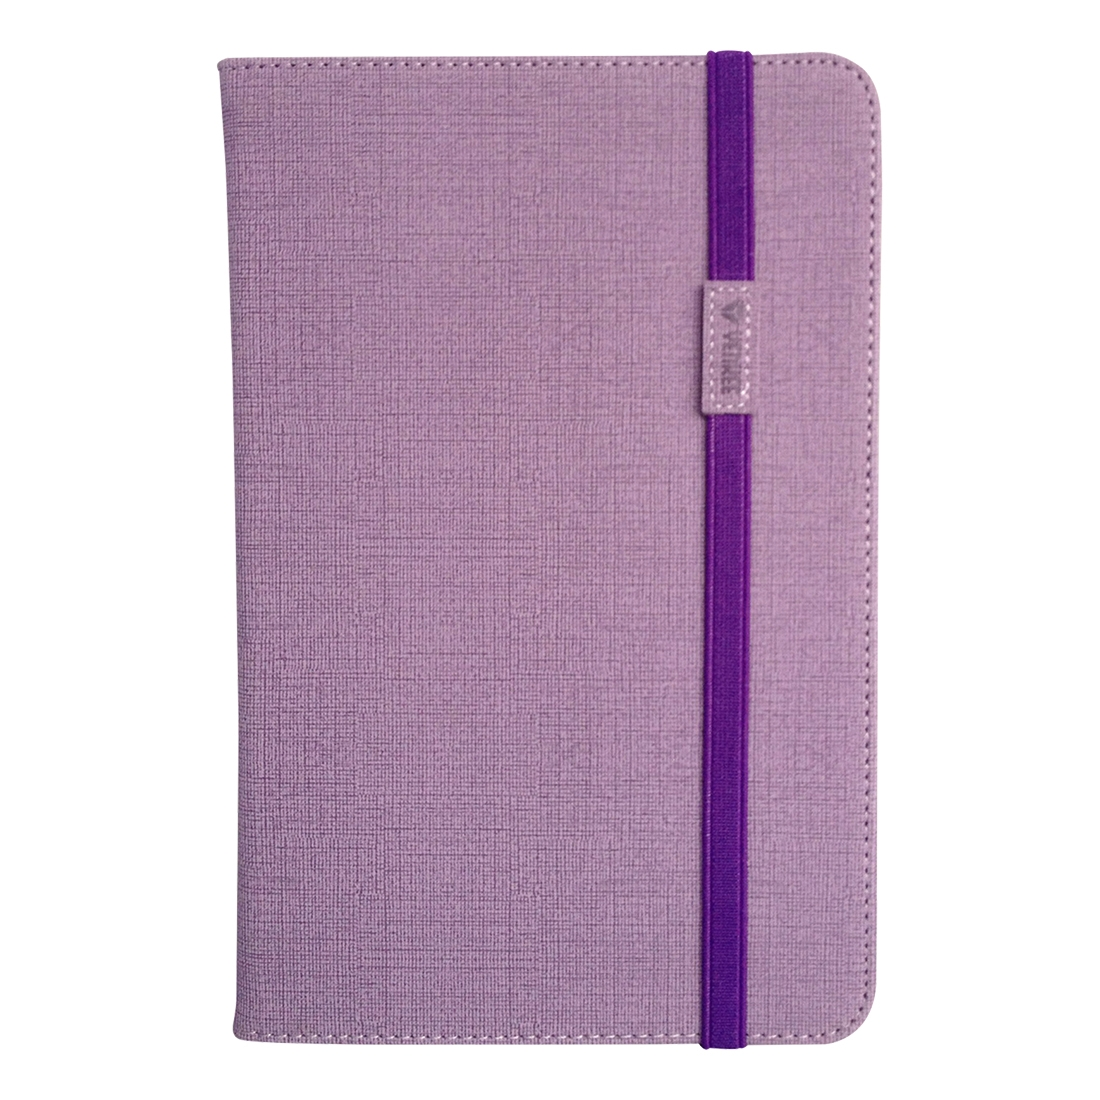 Yenkee Universal Θήκη & Stand for Tablets 8'' - Purple (0815PK)